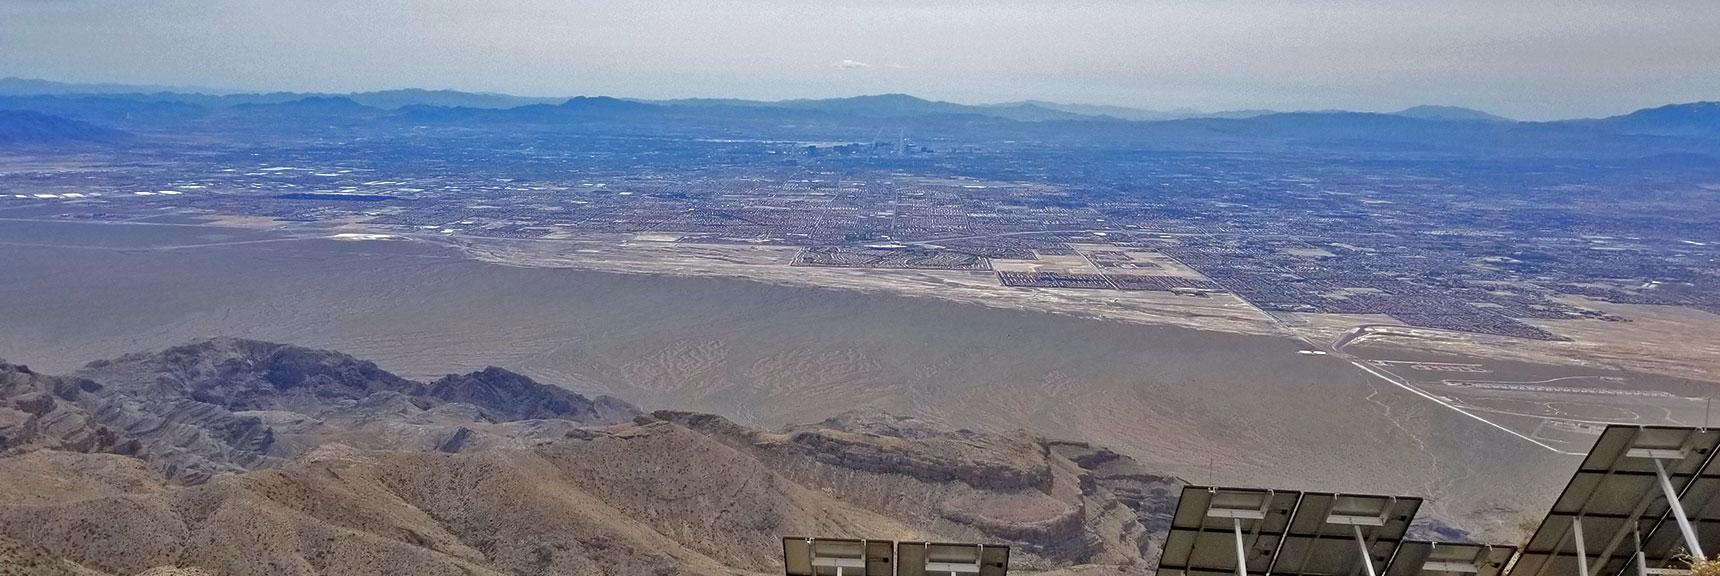 View South Toward Las Vegas from Gass Peak Eastern Summit | Gass Peak Eastern Summit Ultra-marathon Adventure, Nevada